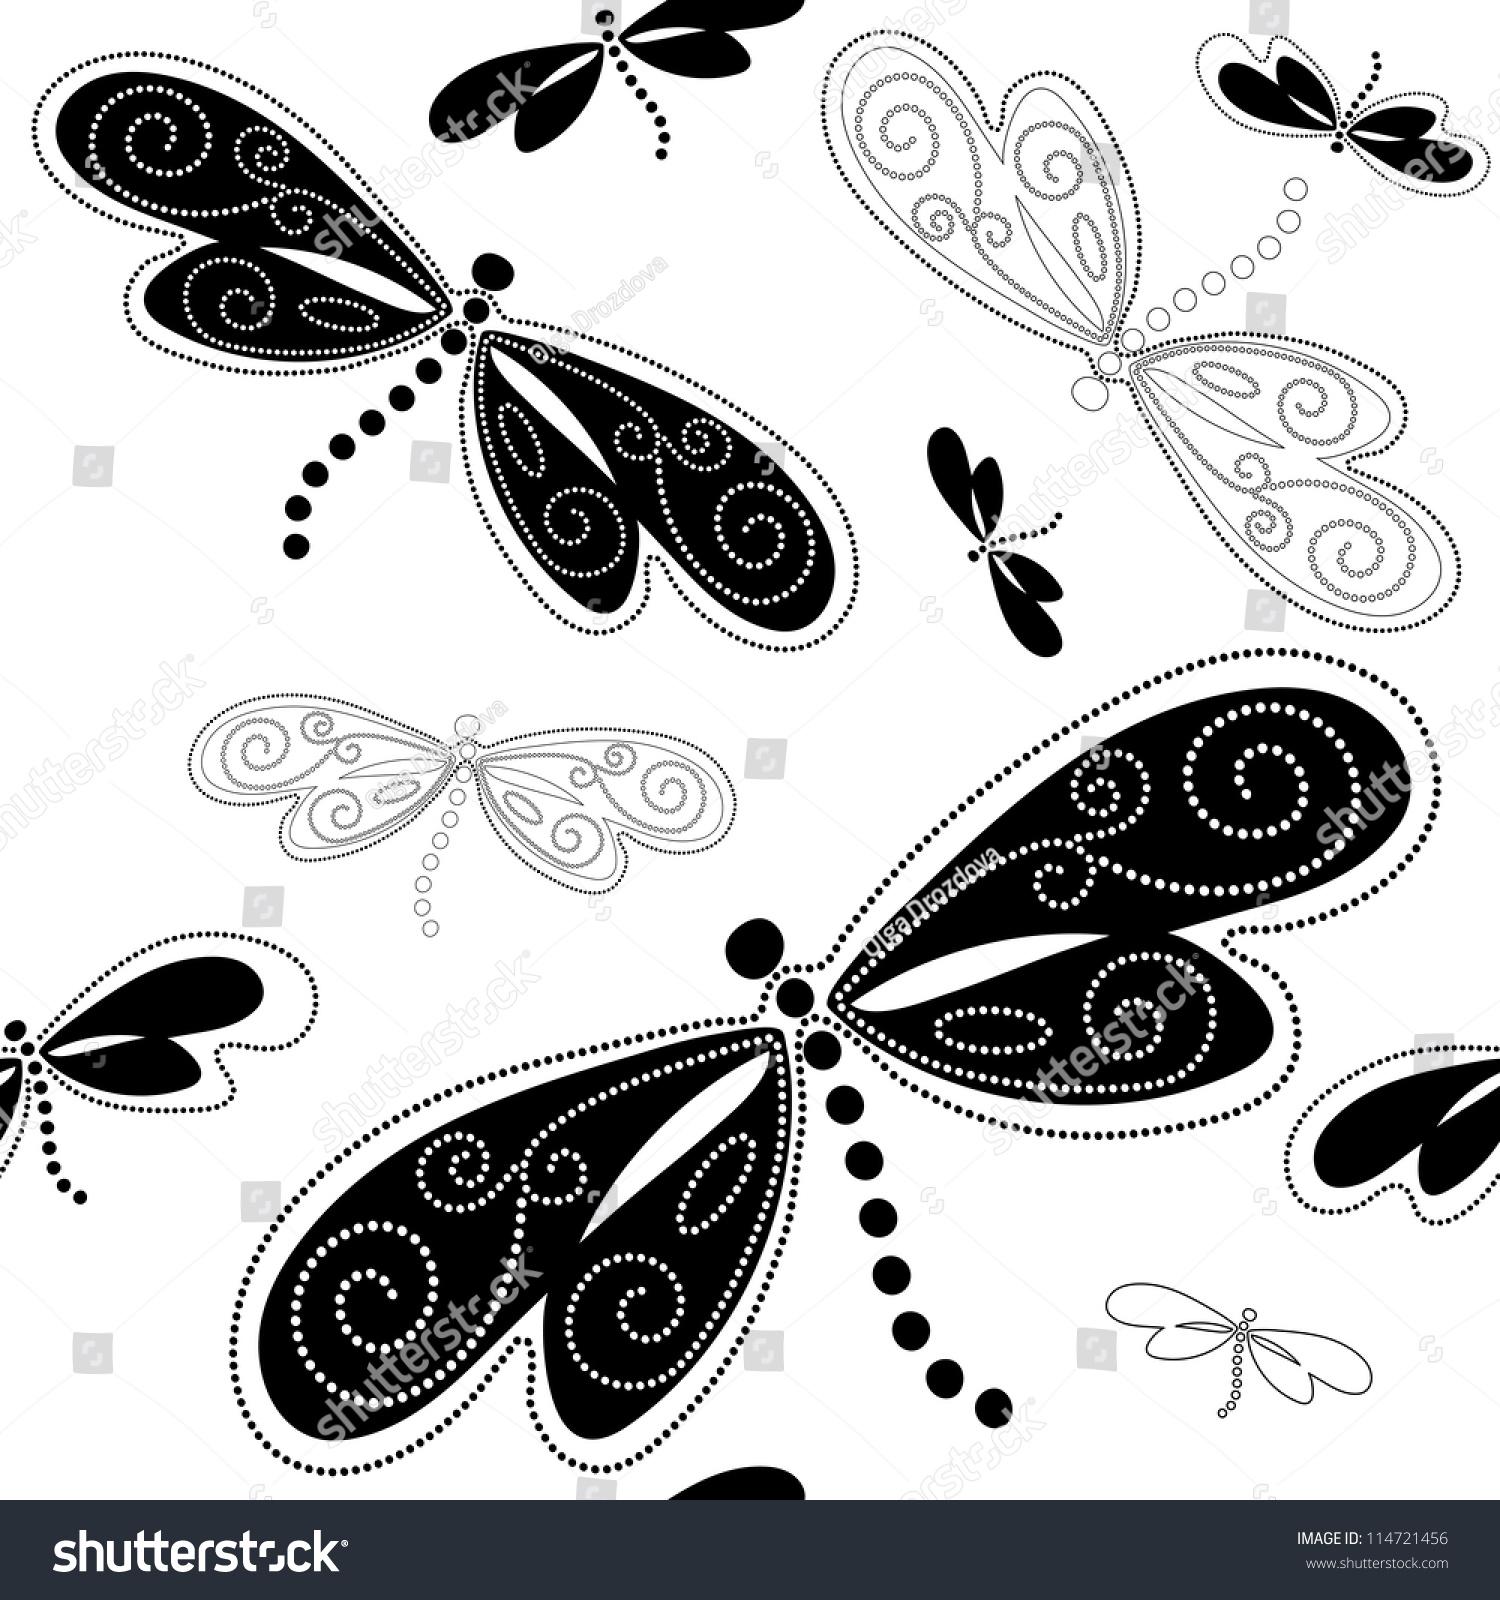 Seamless White Pattern Black Dragonflies Vintage Stock ...